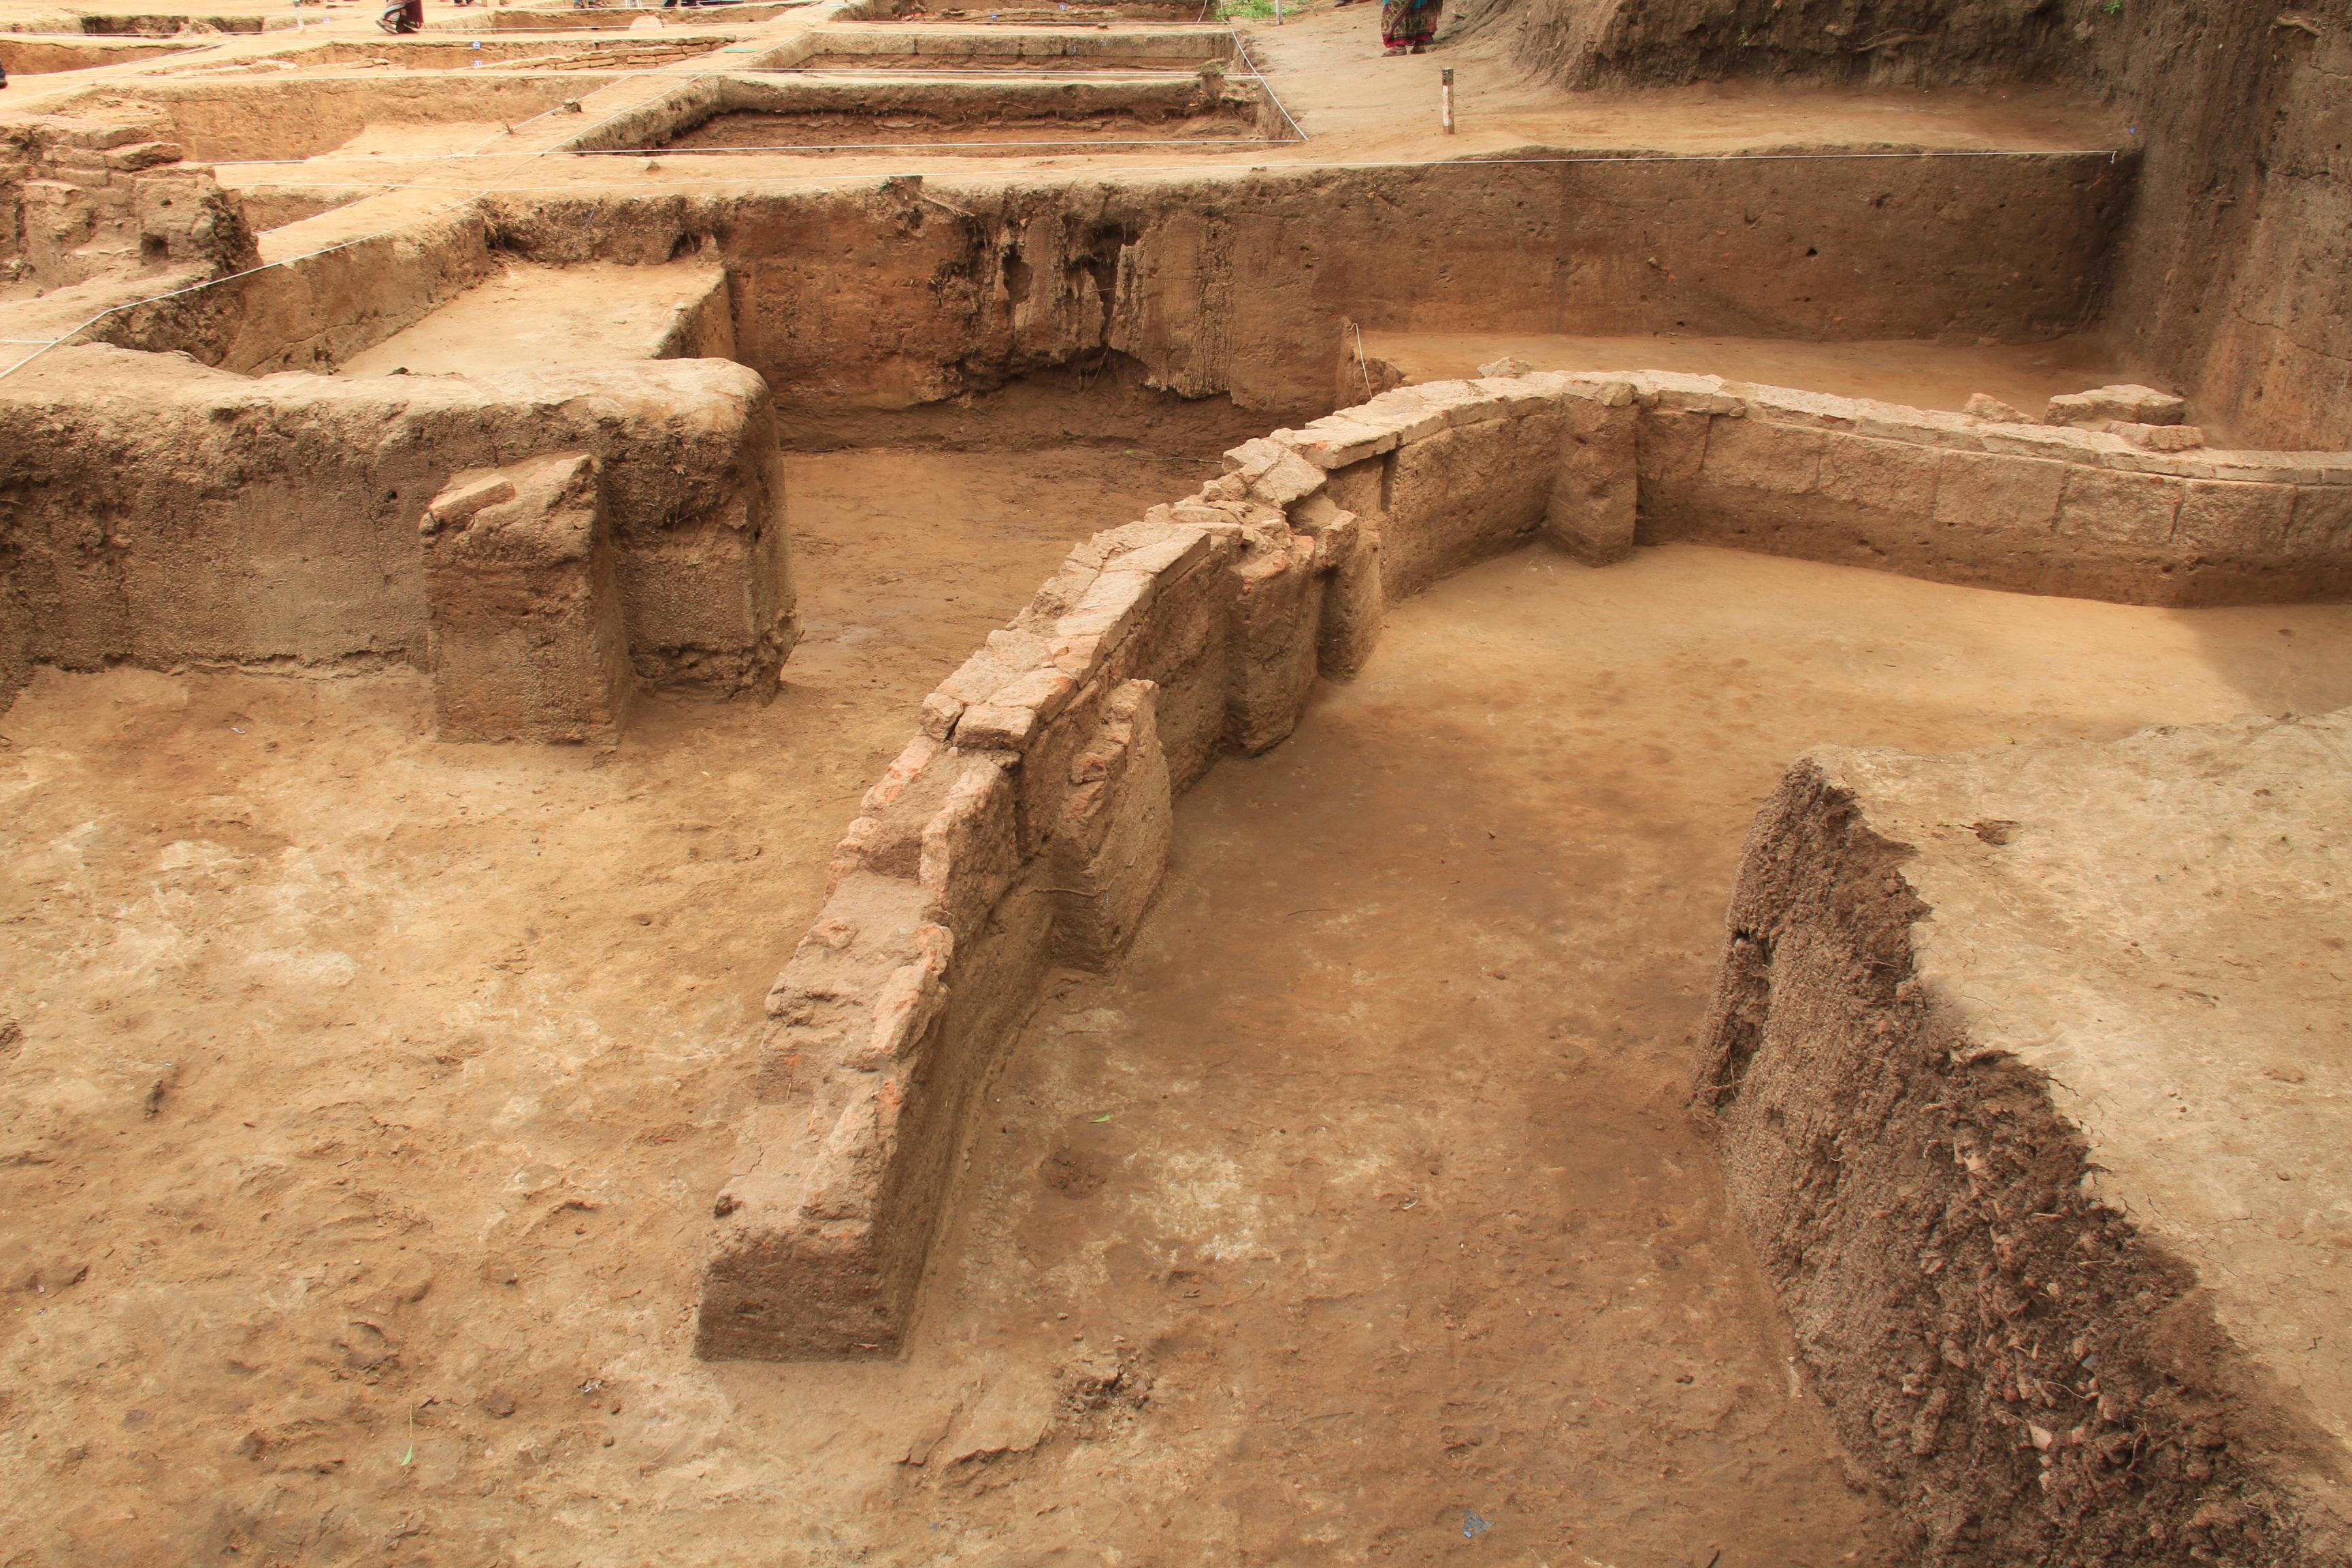 Remains of the Thamirabarani River Civilisation in present-day Tamil Nadu. (Tamil Nadu Archaeology Department)